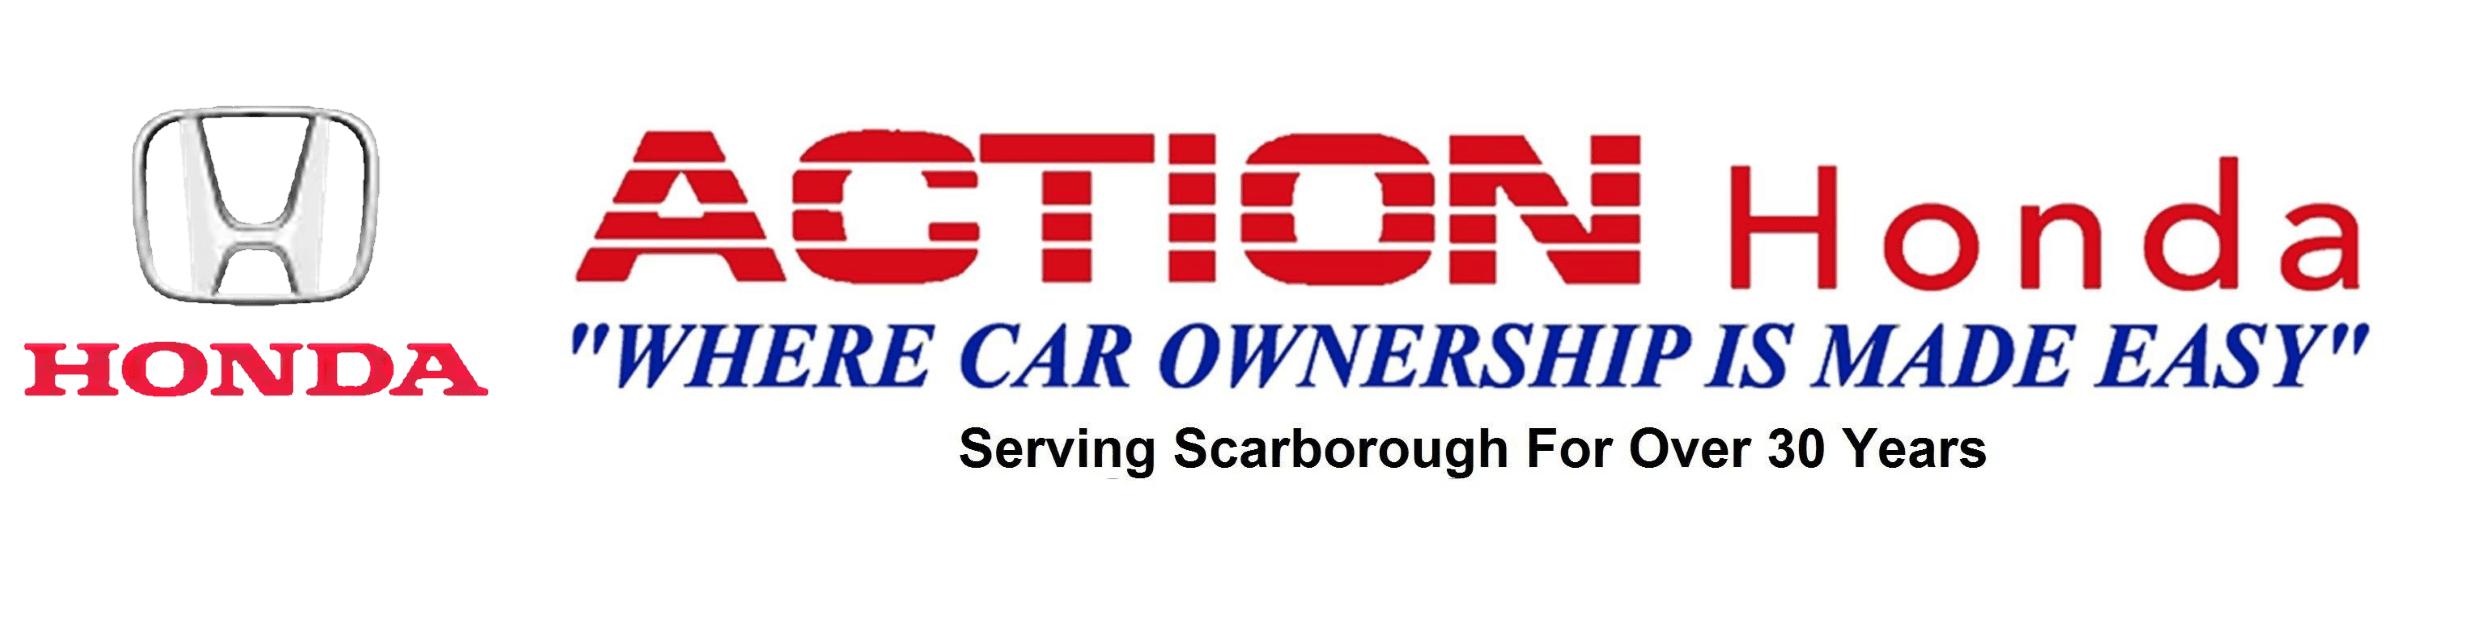 2019 Honda Pilot in Scarborough, ON | ACTION HONDA